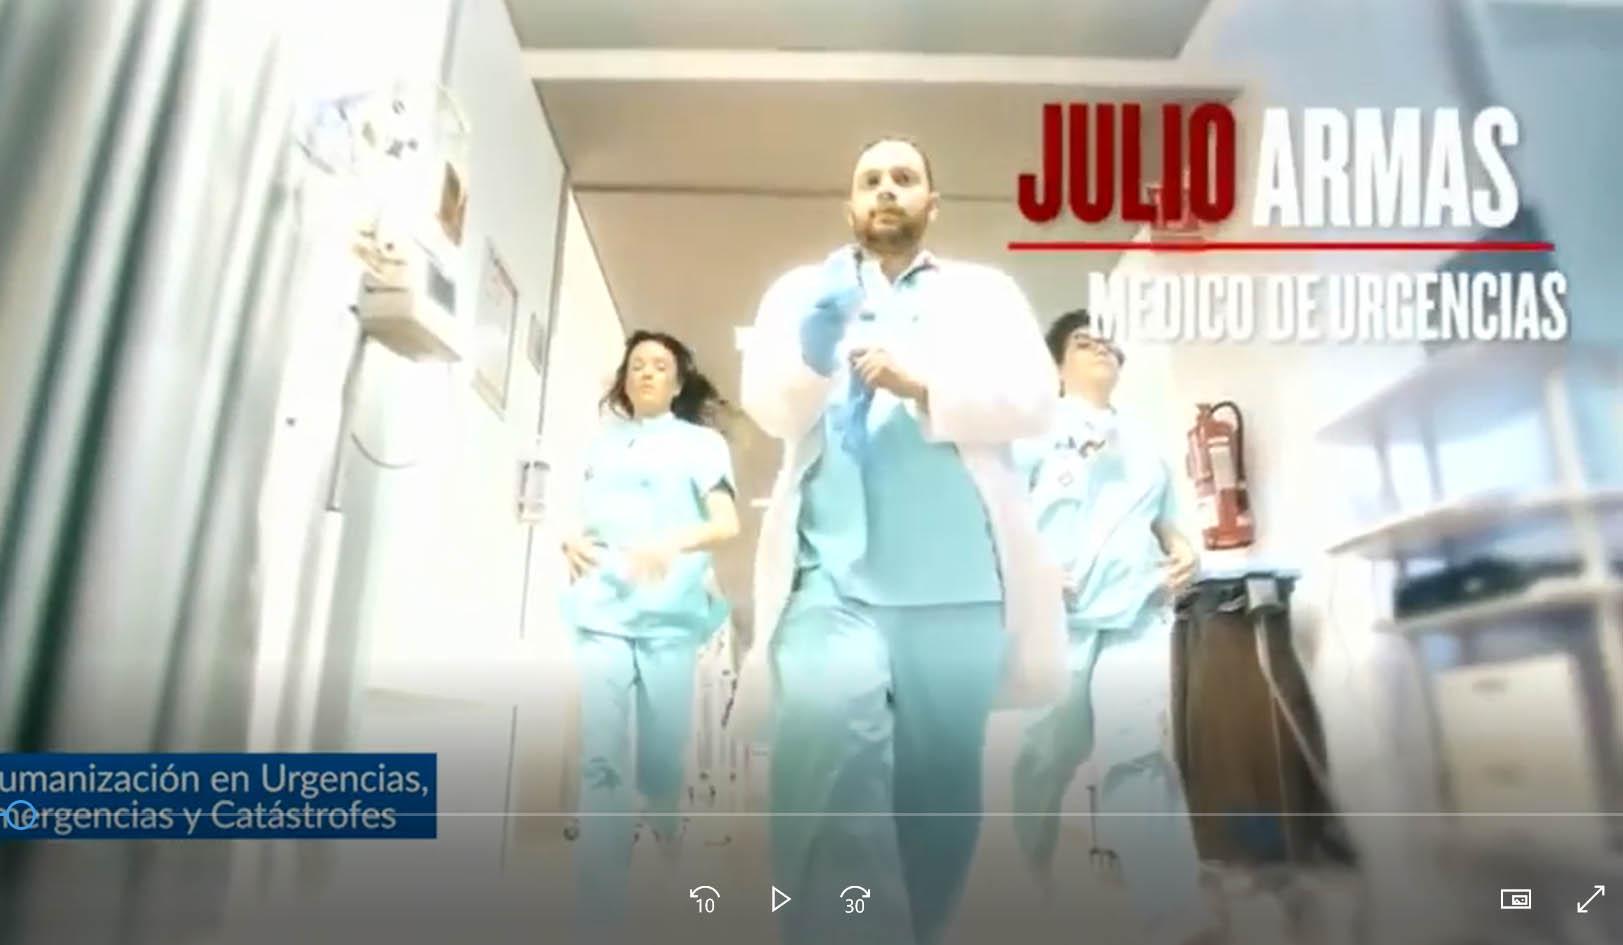 ProyectoHurge_JulioArmas